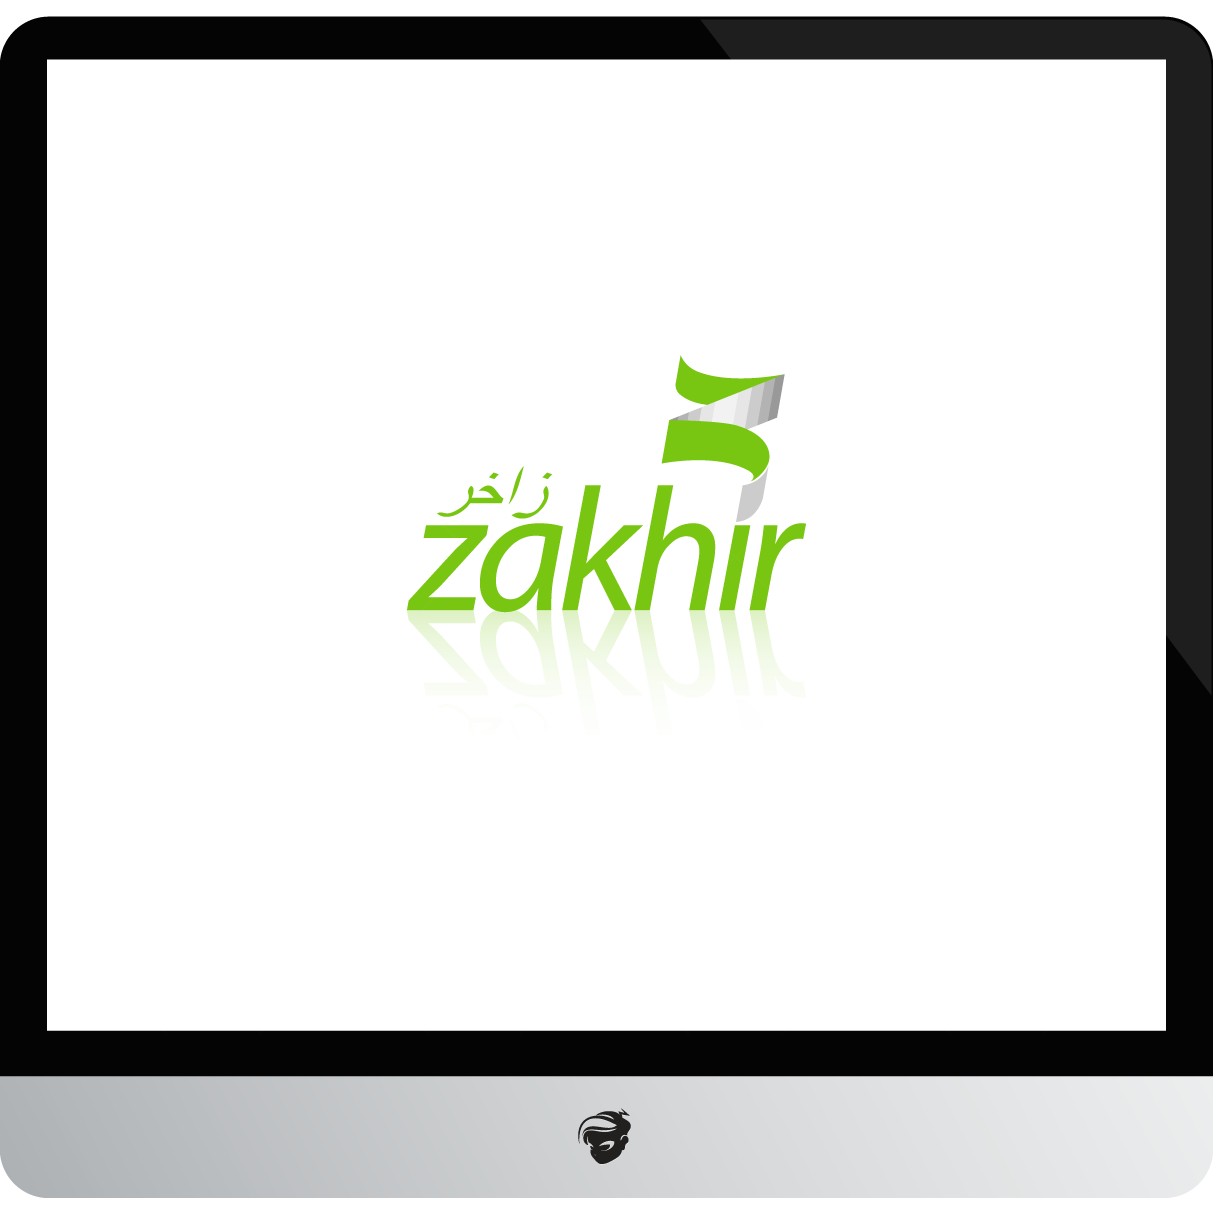 Logo Design by zesthar - Entry No. 97 in the Logo Design Contest Zakhir Logo Design.